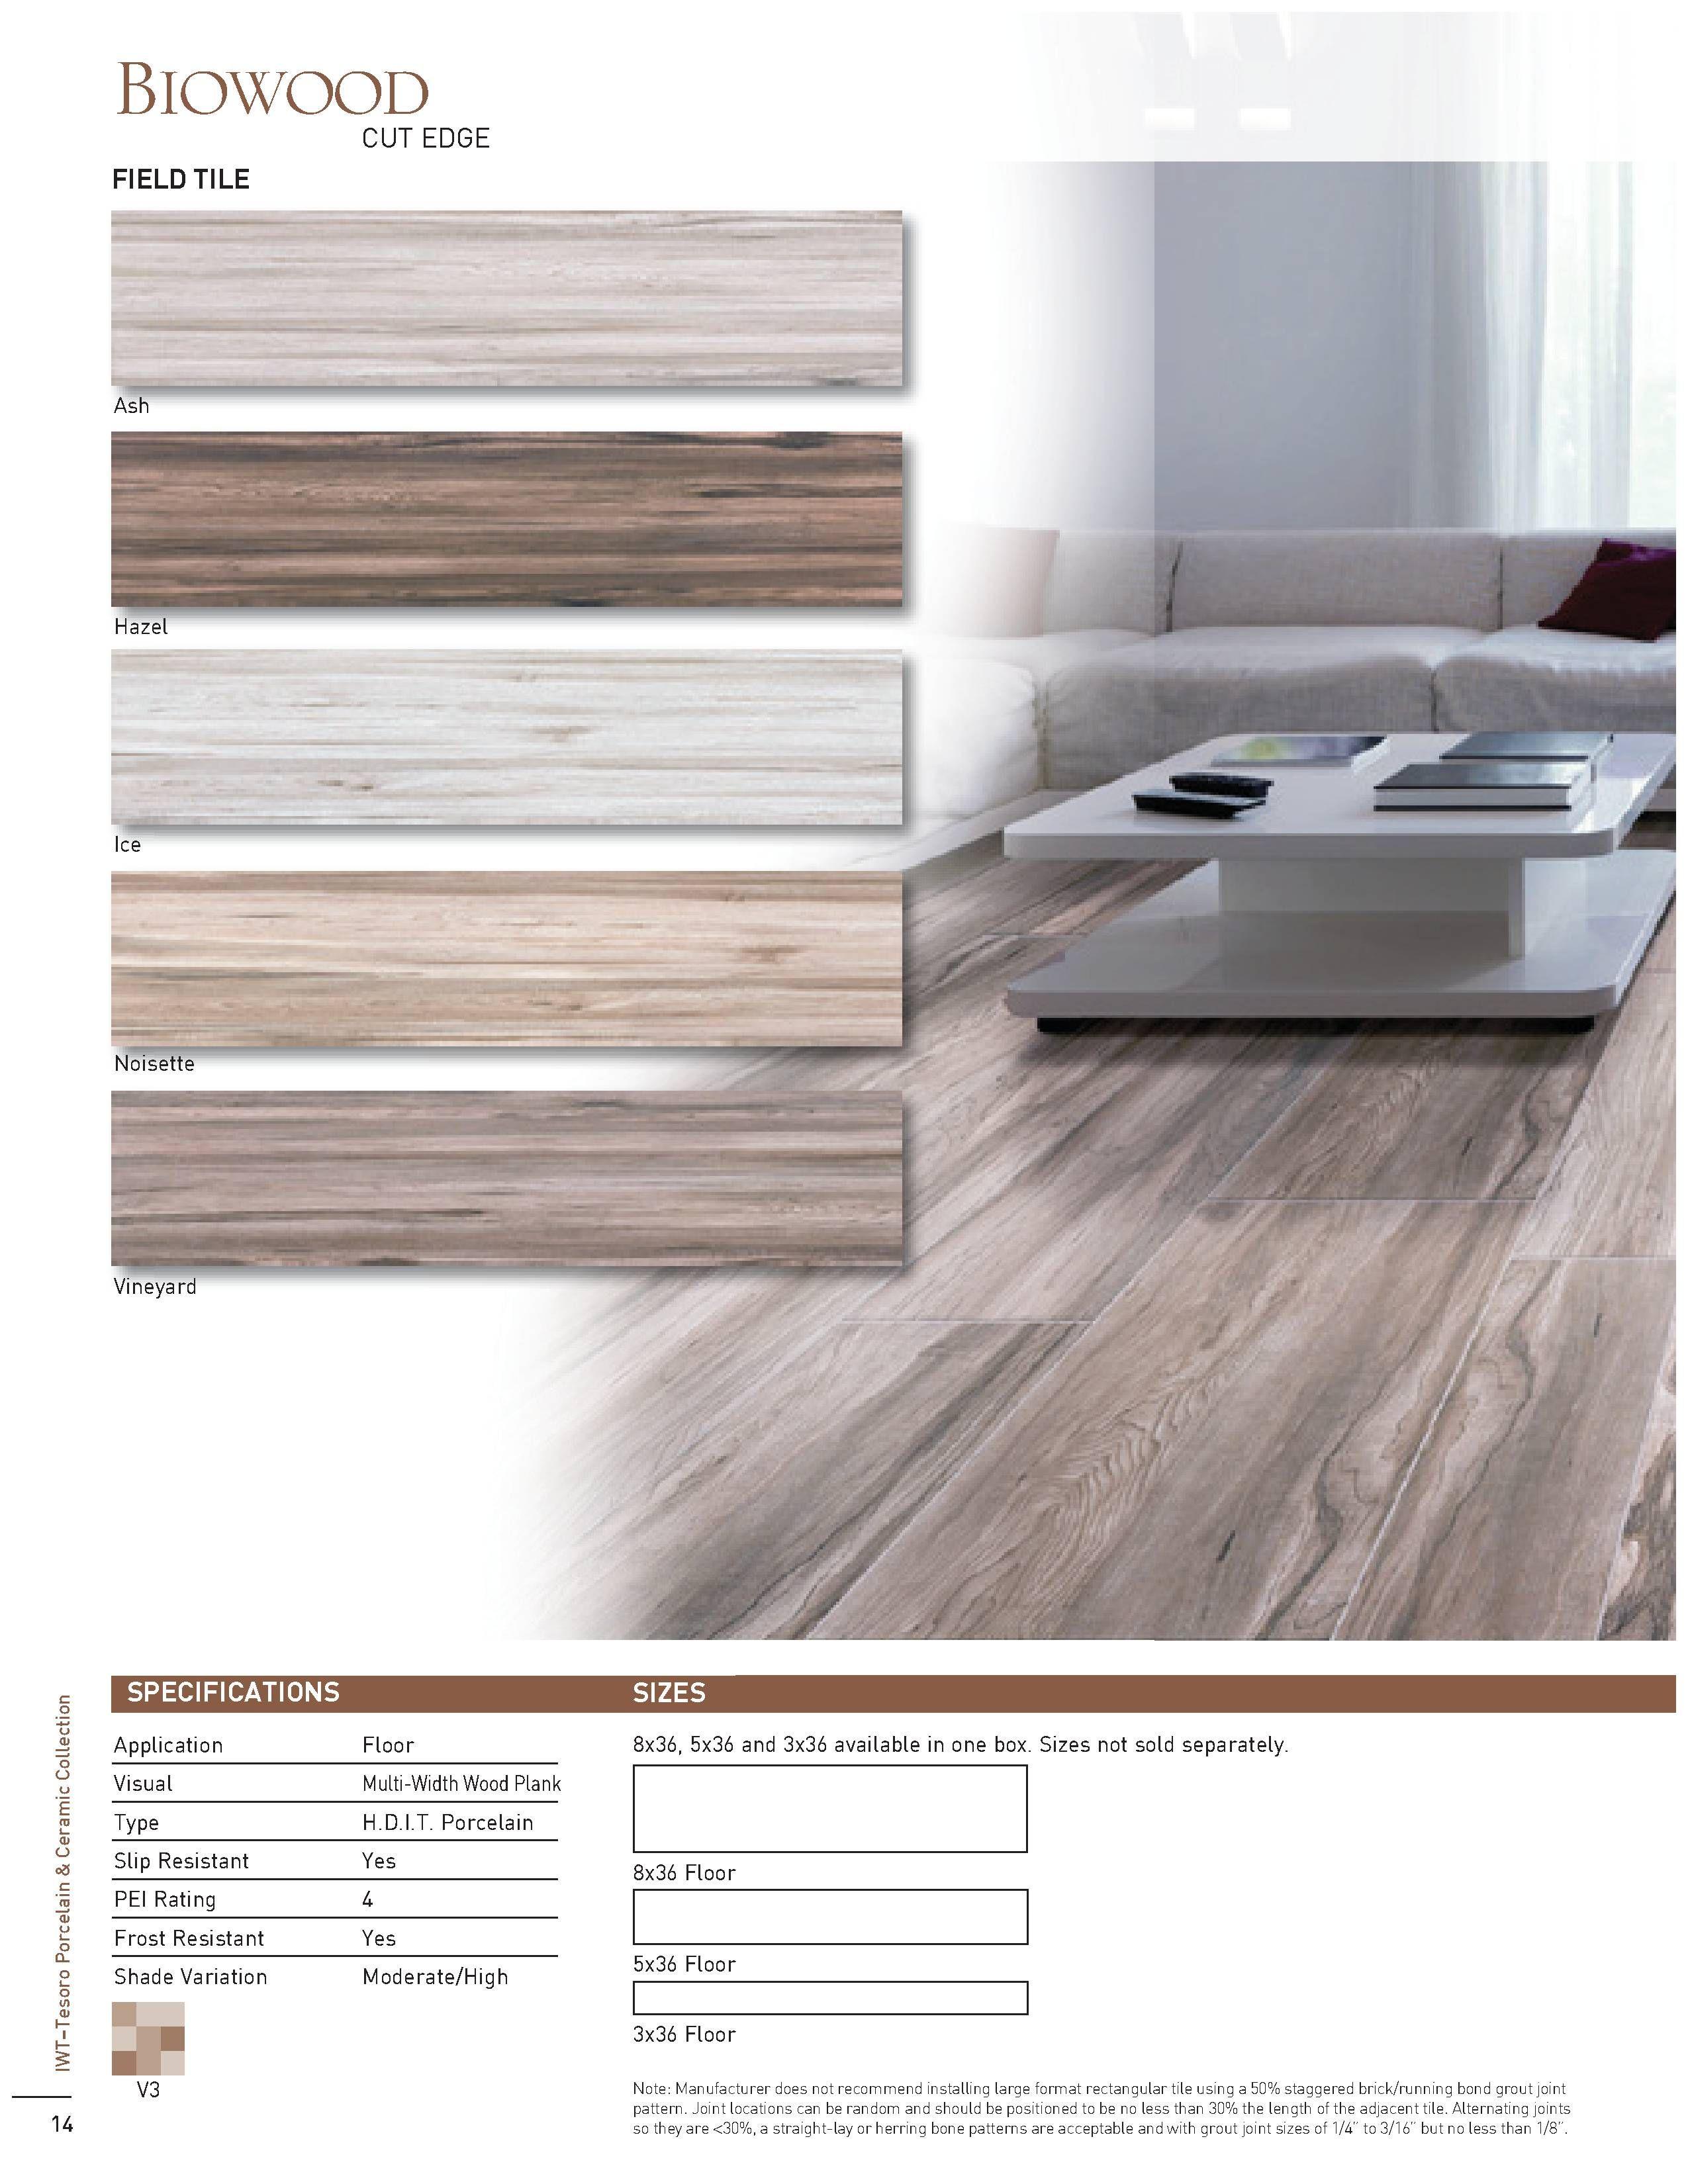 tesoro biowood brochure flooring